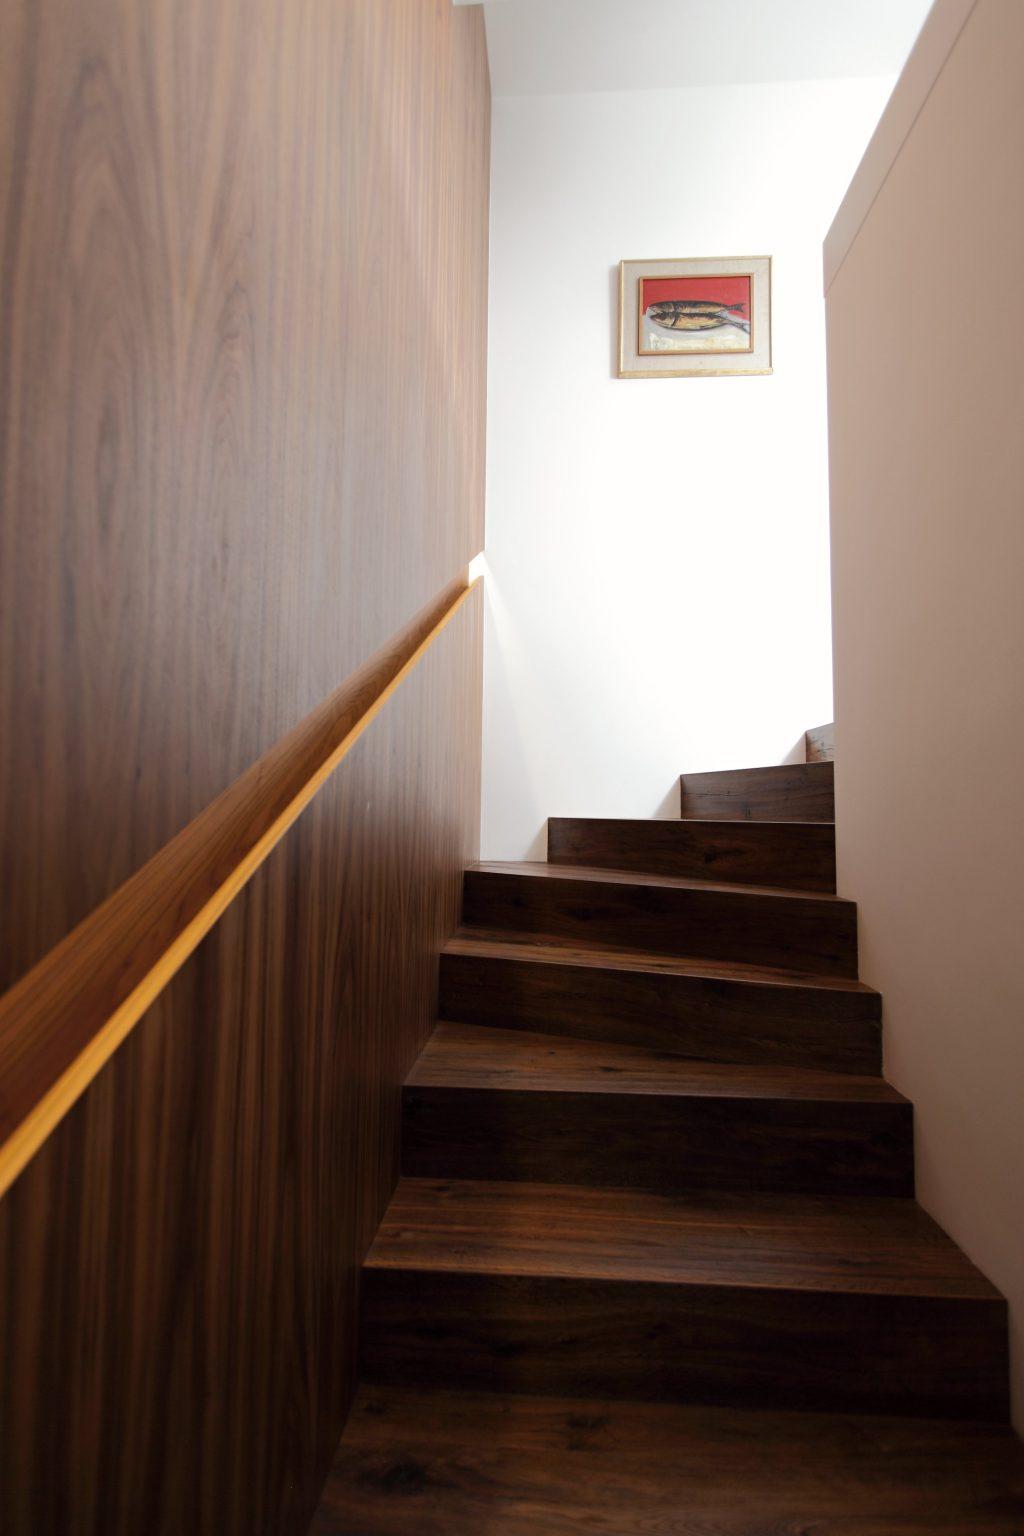 Obklady stien a schody na mieru, BRIK Kremnica, masív orech americký